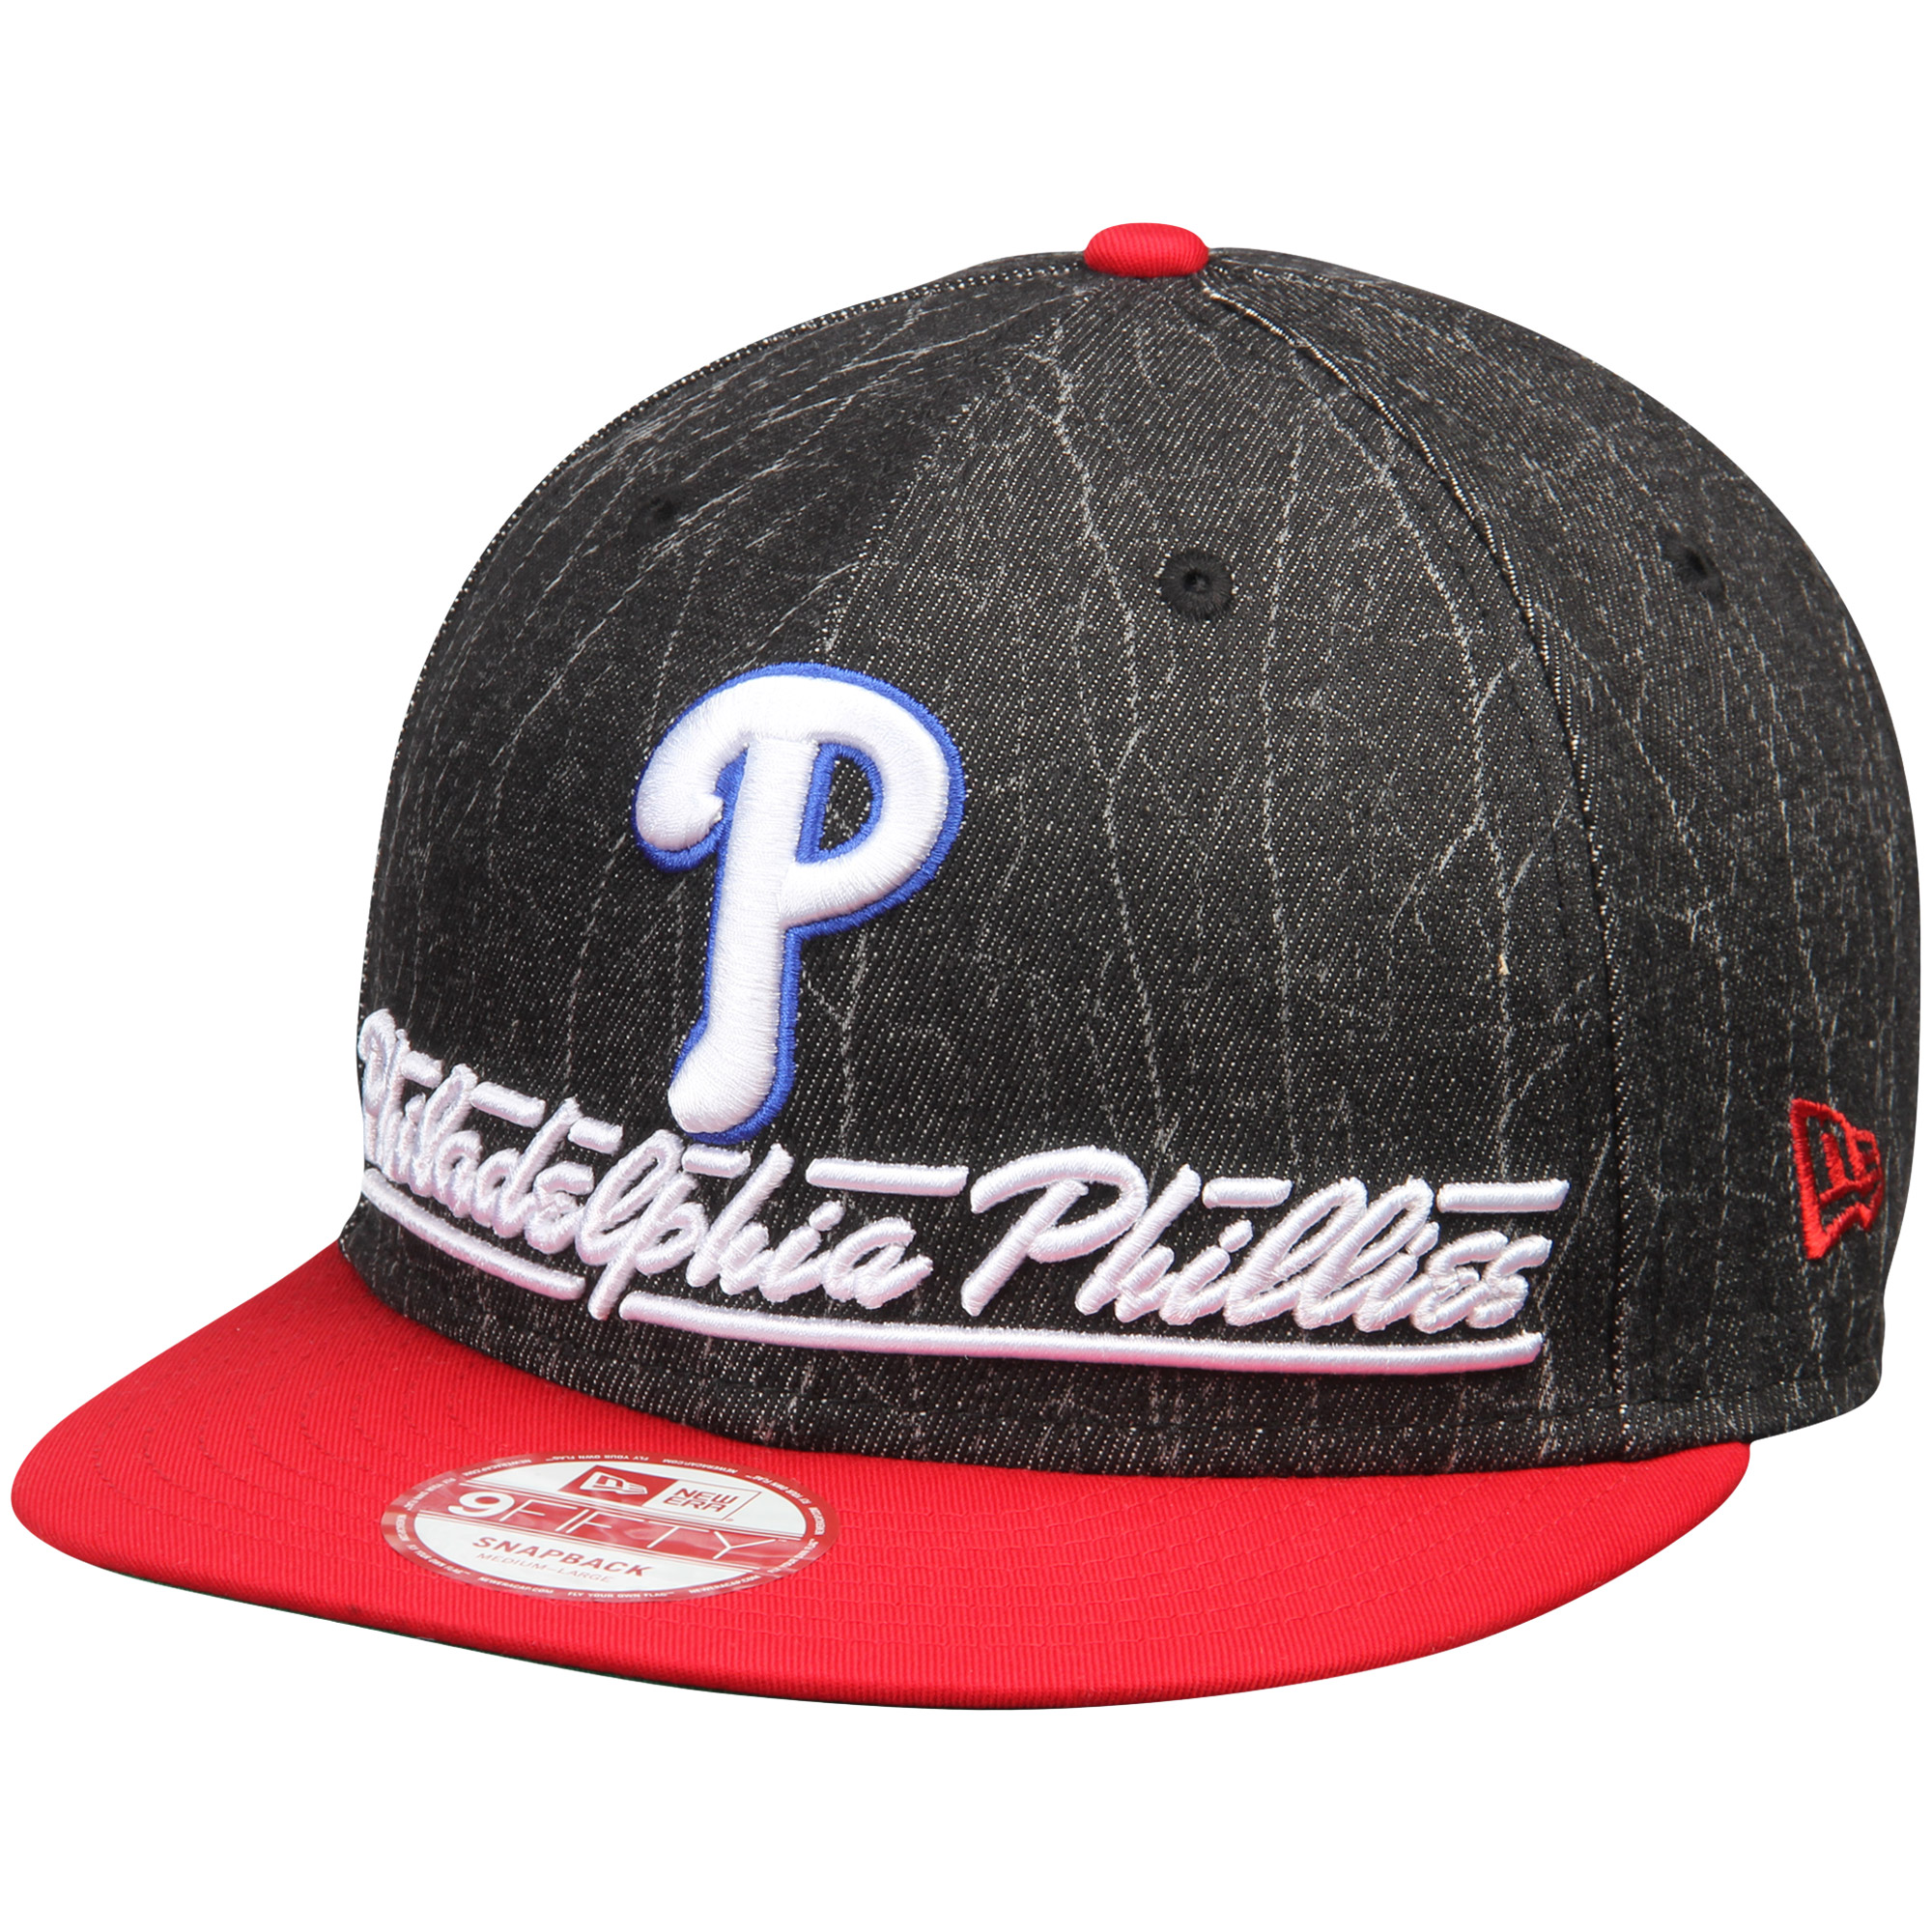 Philadelphia Phillies New Era Lightning Strike 9FIFTY Snapback Adjustable Hat - Black/Red - M/L